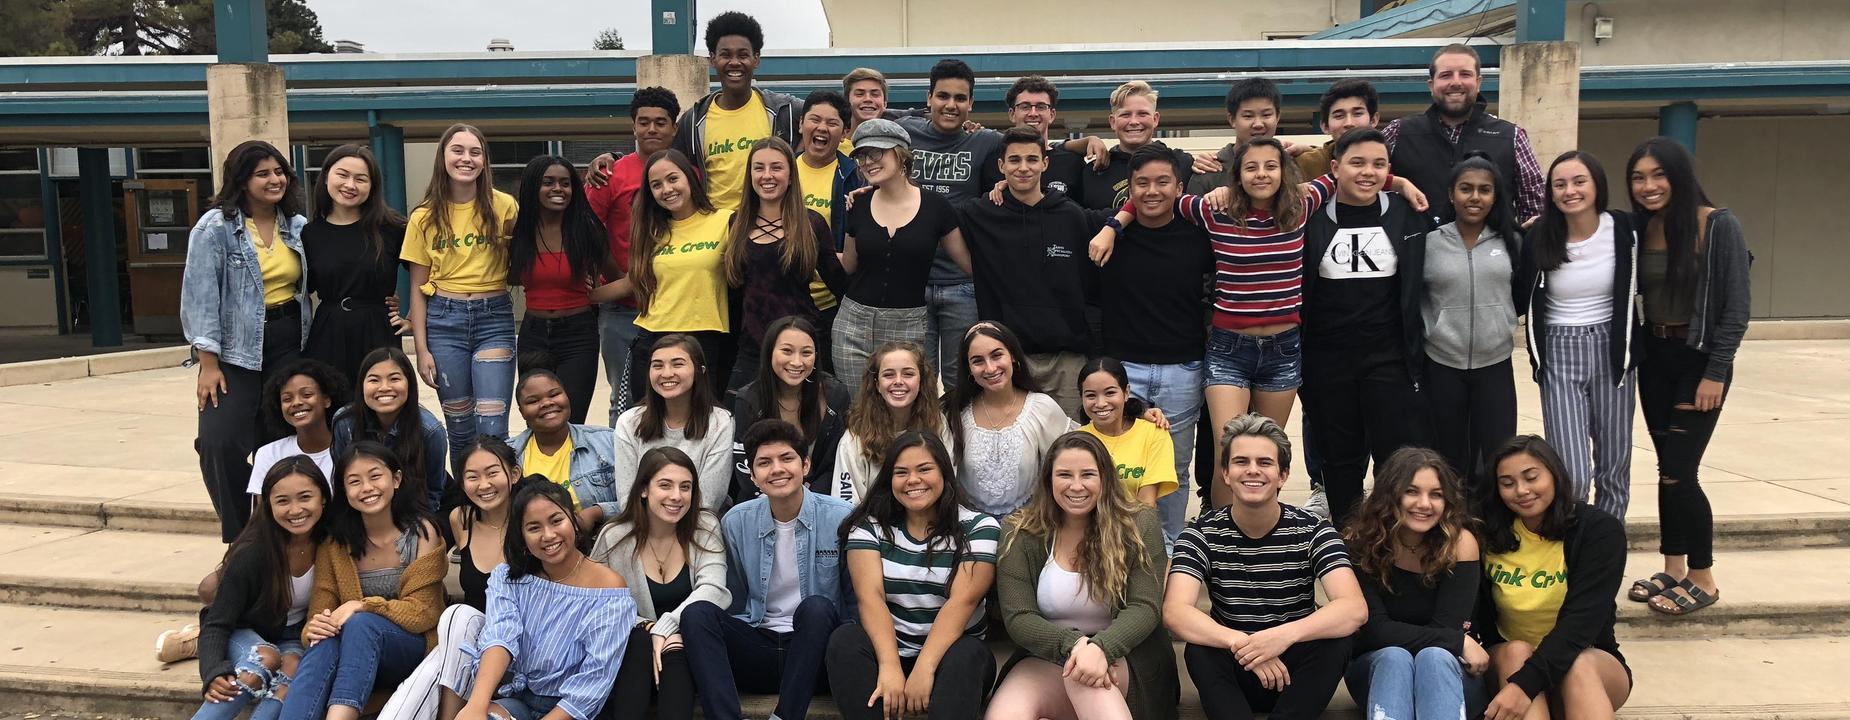 2018 CVHS Leadership Class